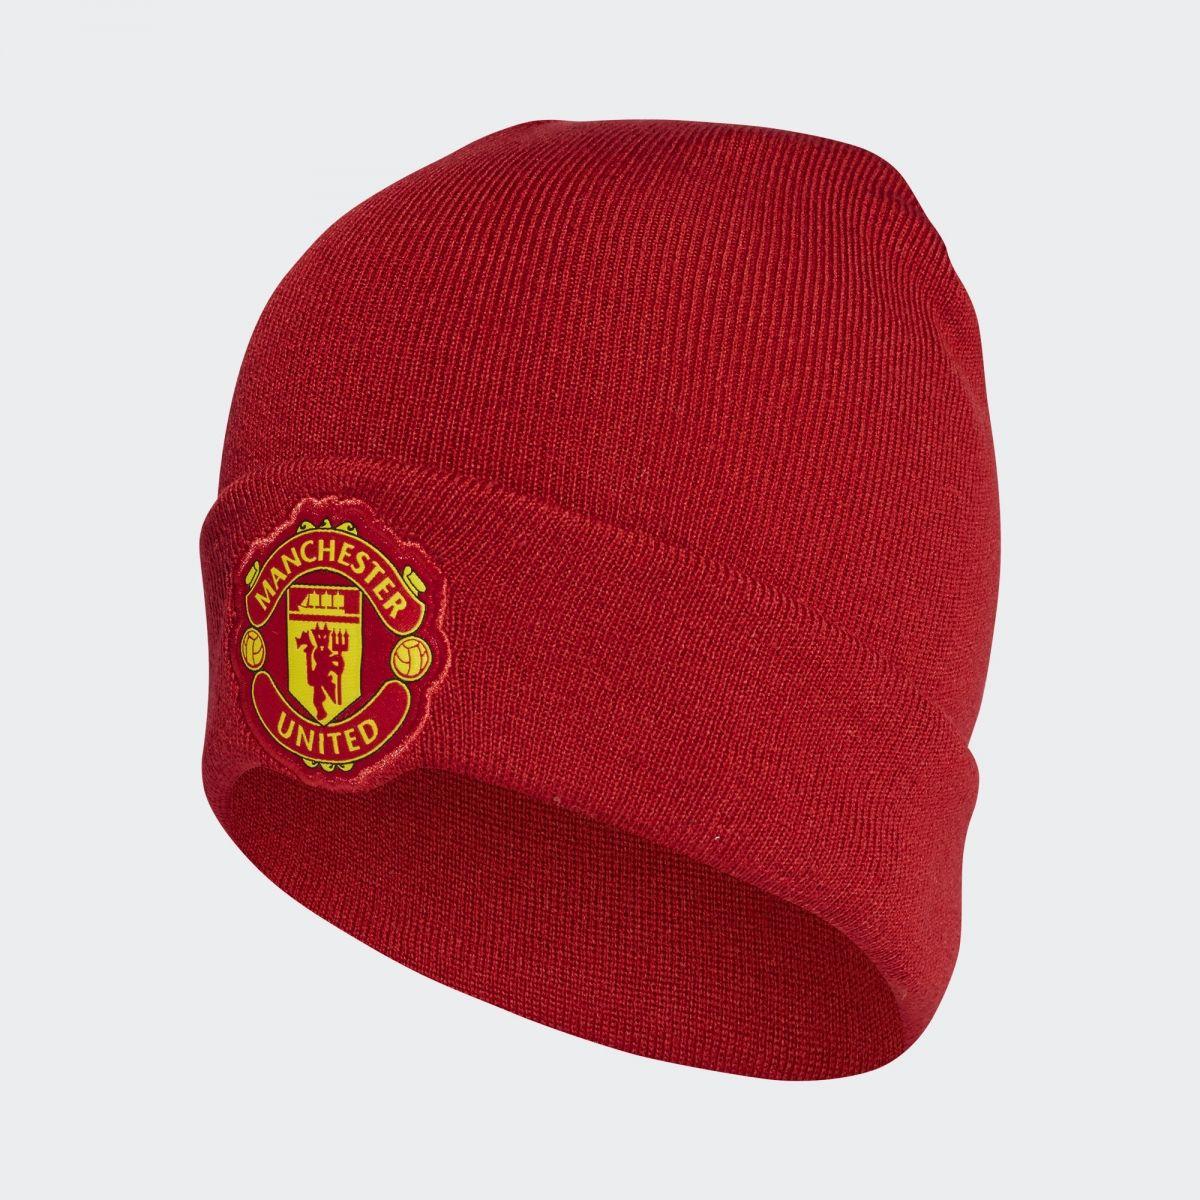 e016f90a3c3 Type Caps adidas Manchester United Home Beanie